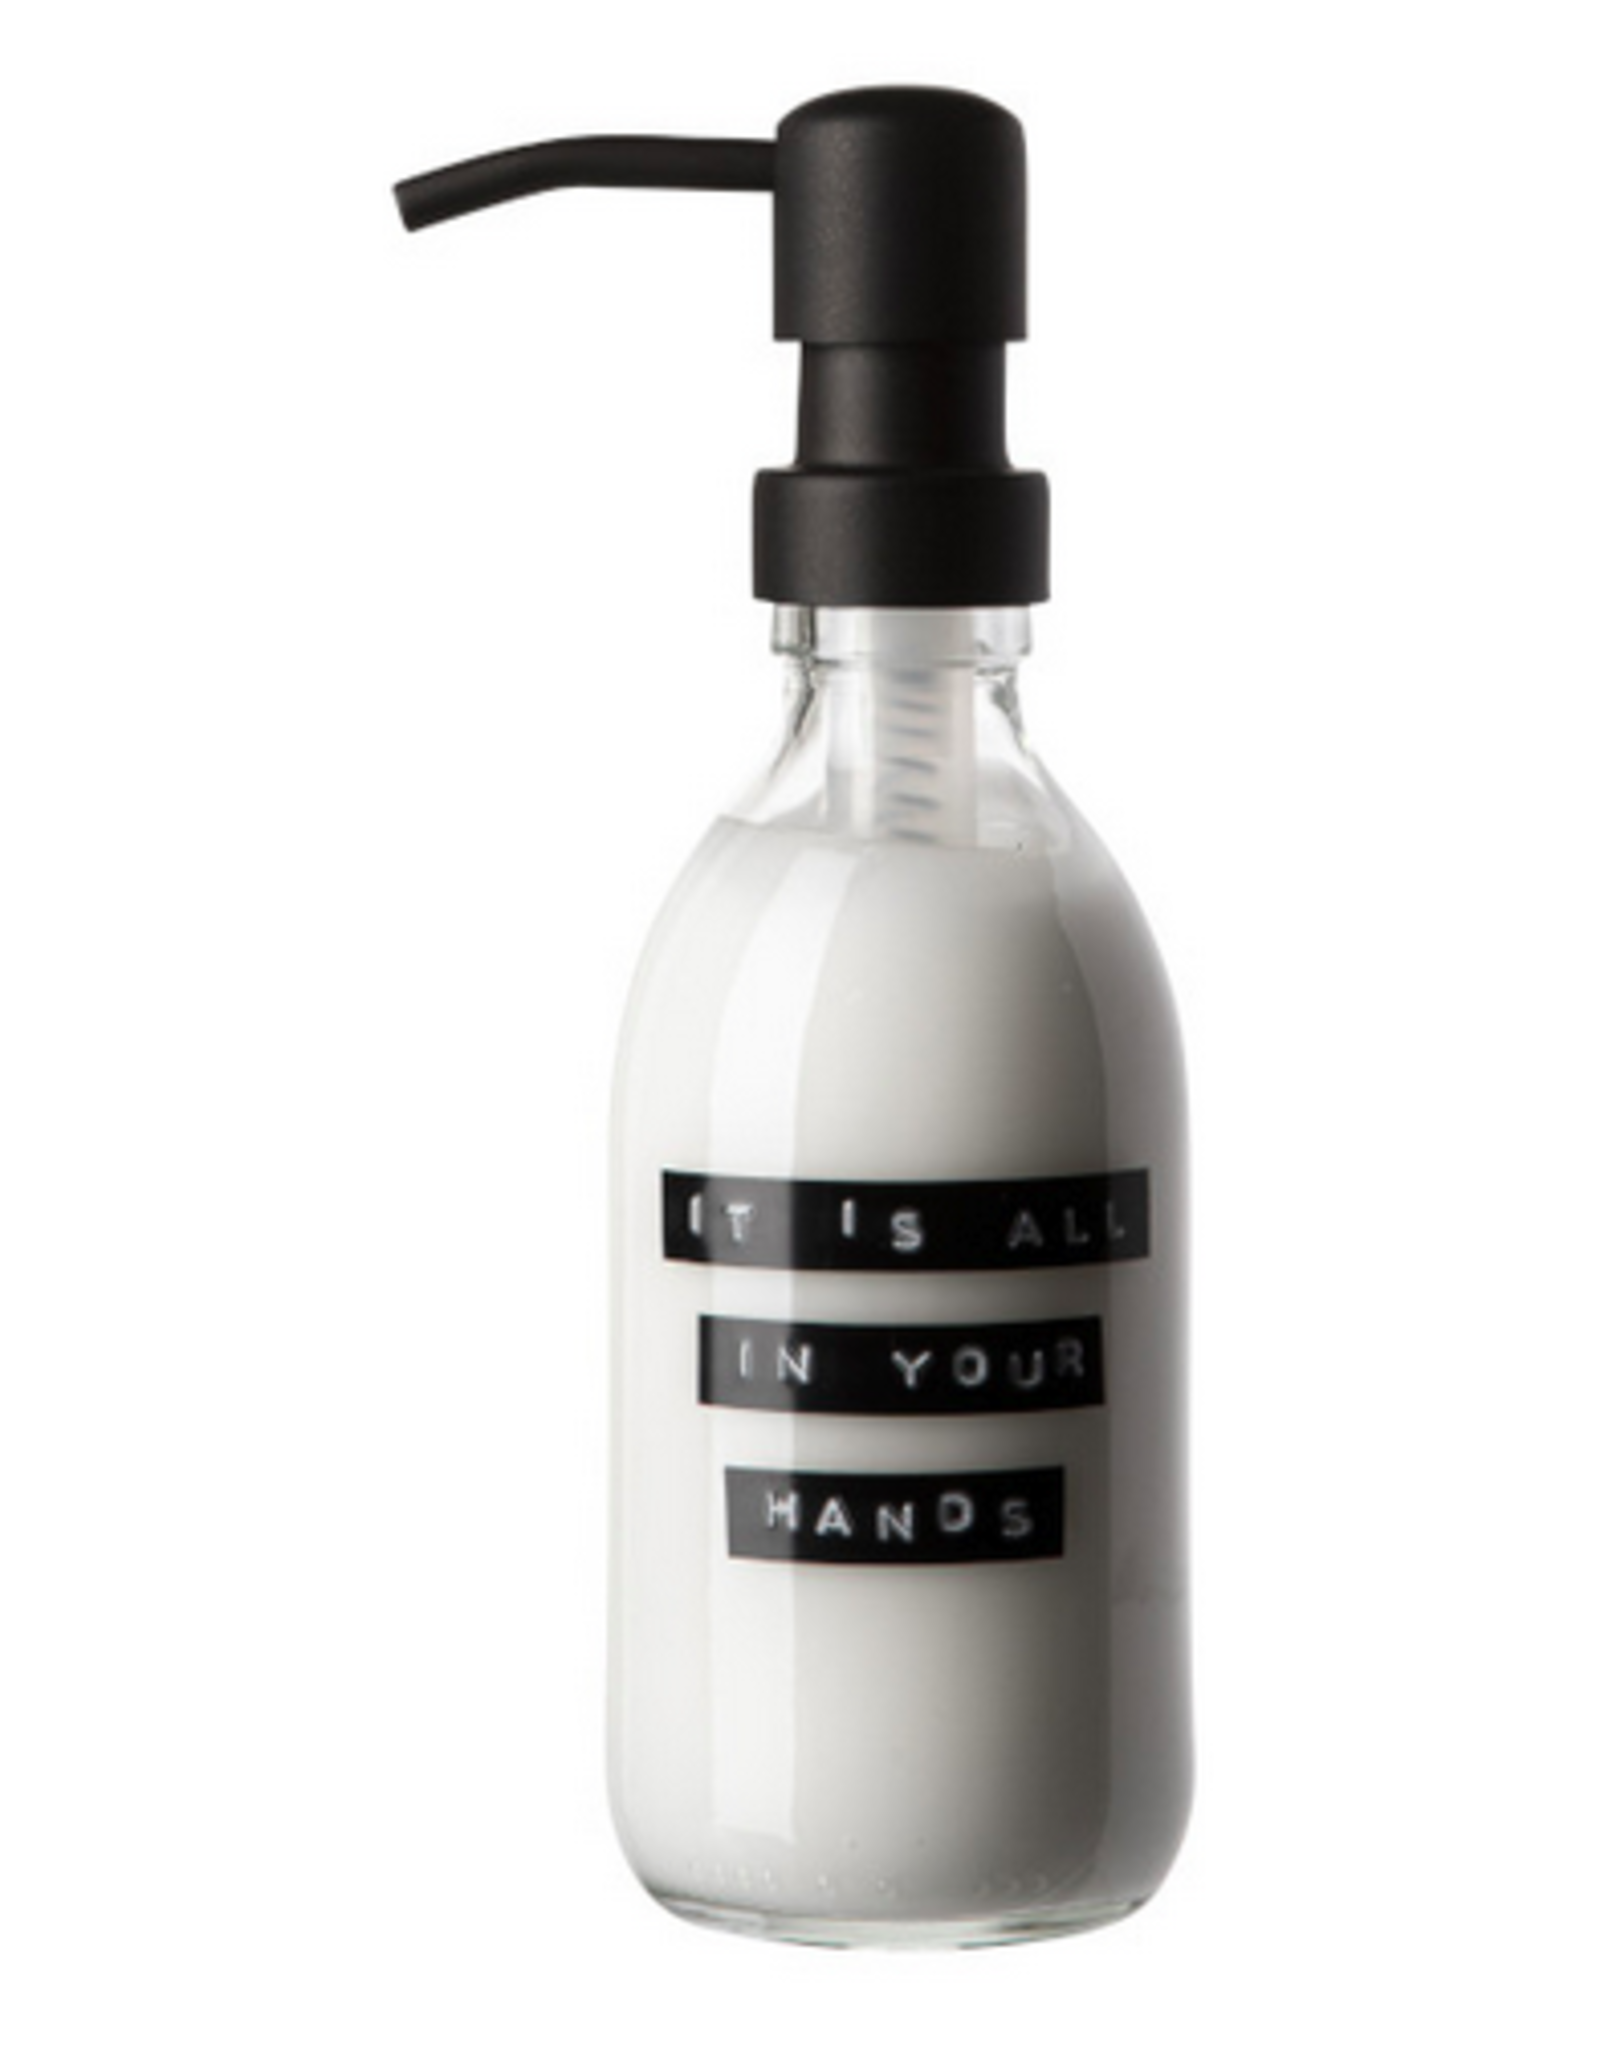 Wellmark Wellmark - Handcrème helder glas - zwart - 250ml - It is all in your hands